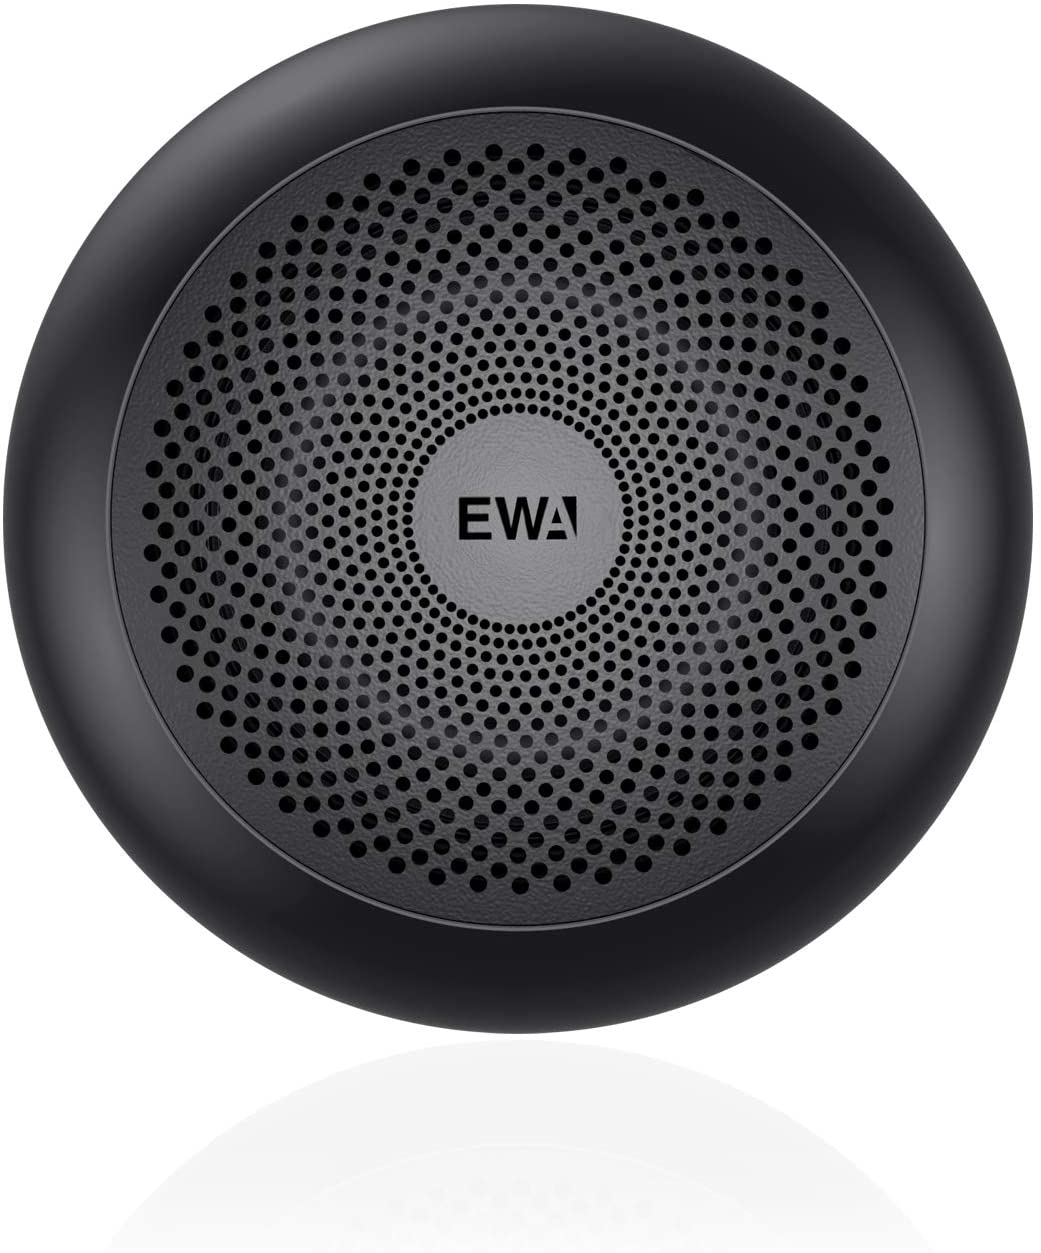 A110 TWS Mini Bluetooth Speakers by EWA